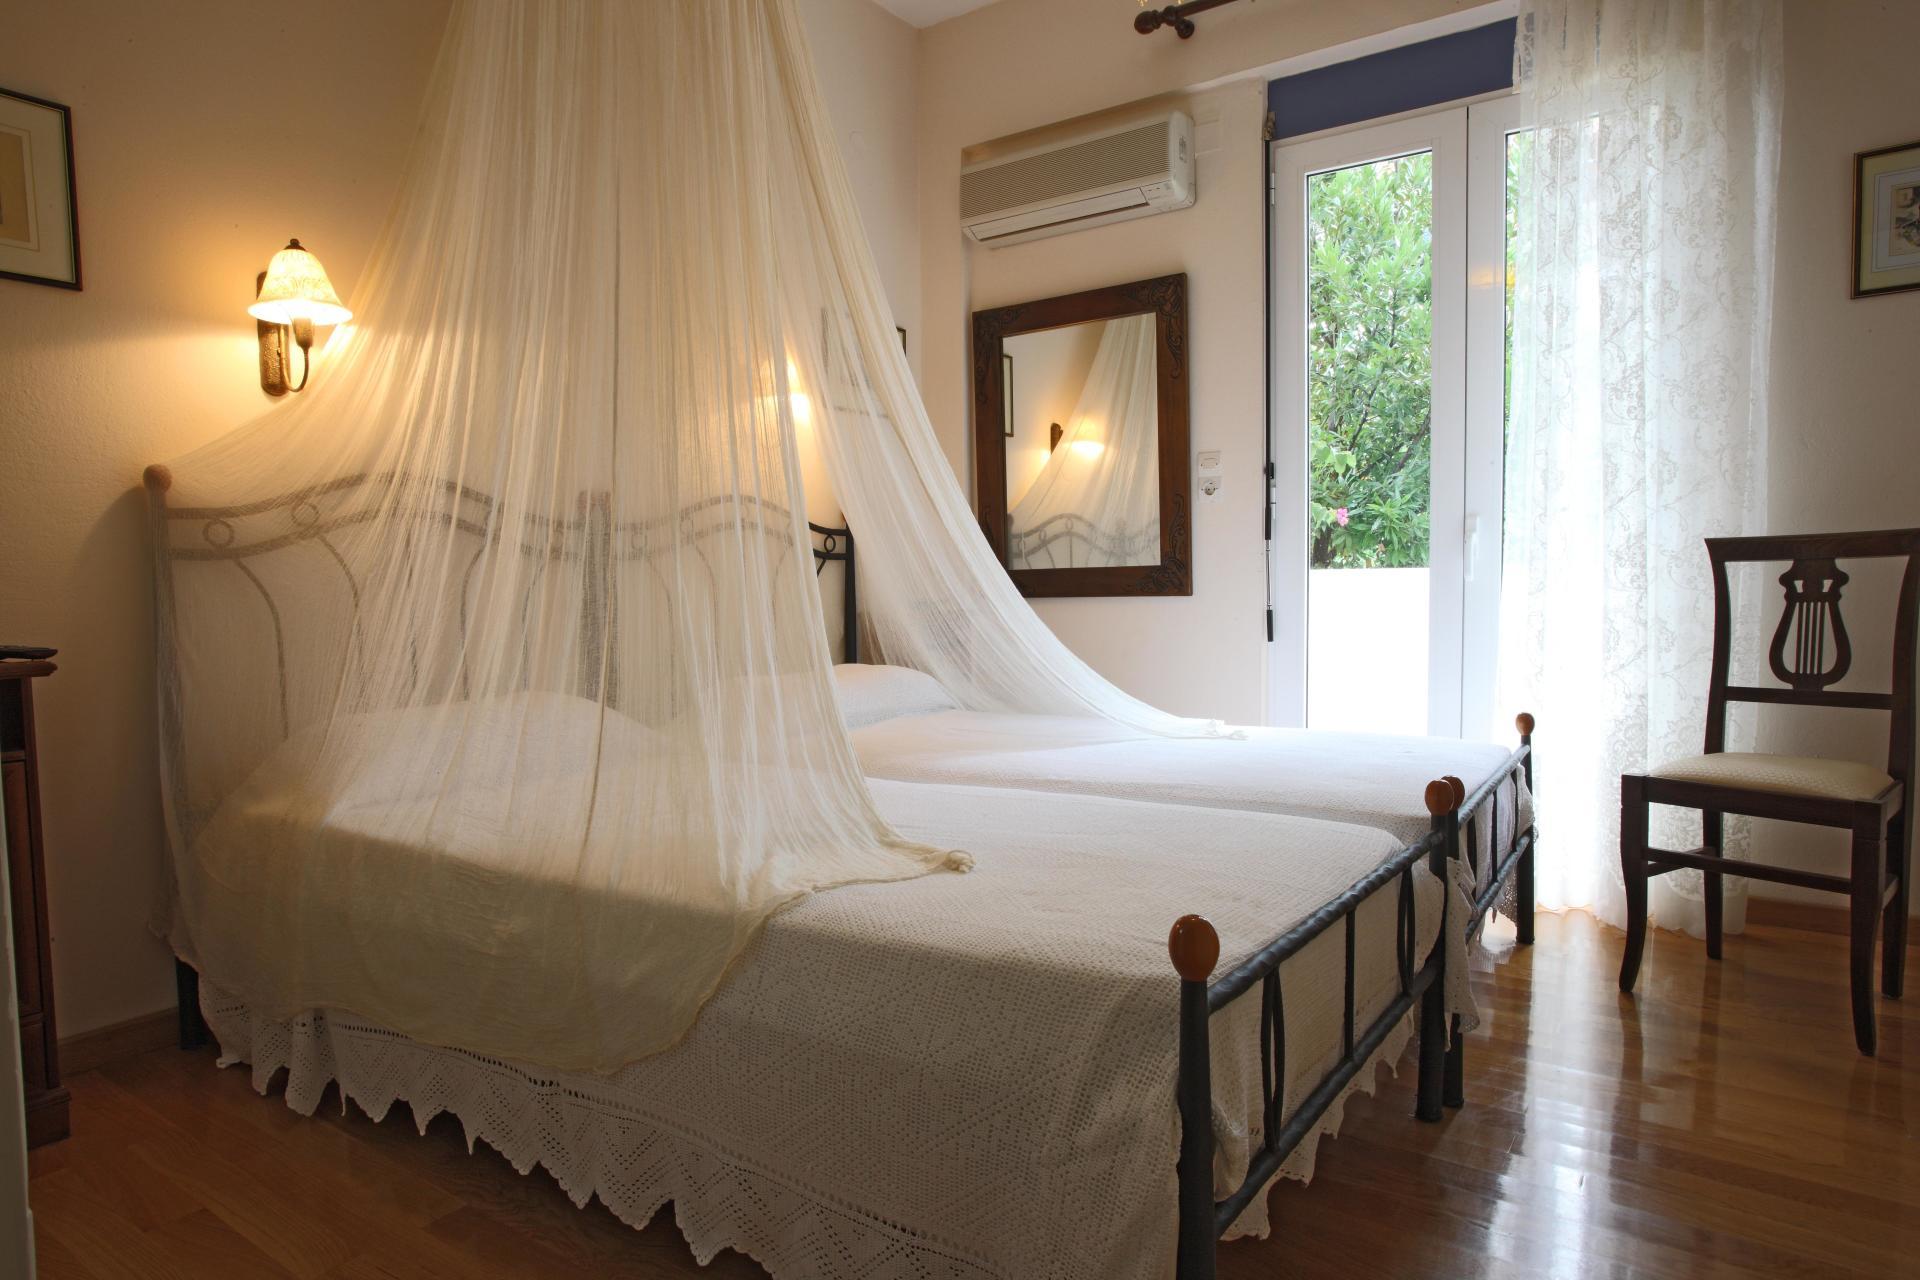 Canopies in twin bedrooms